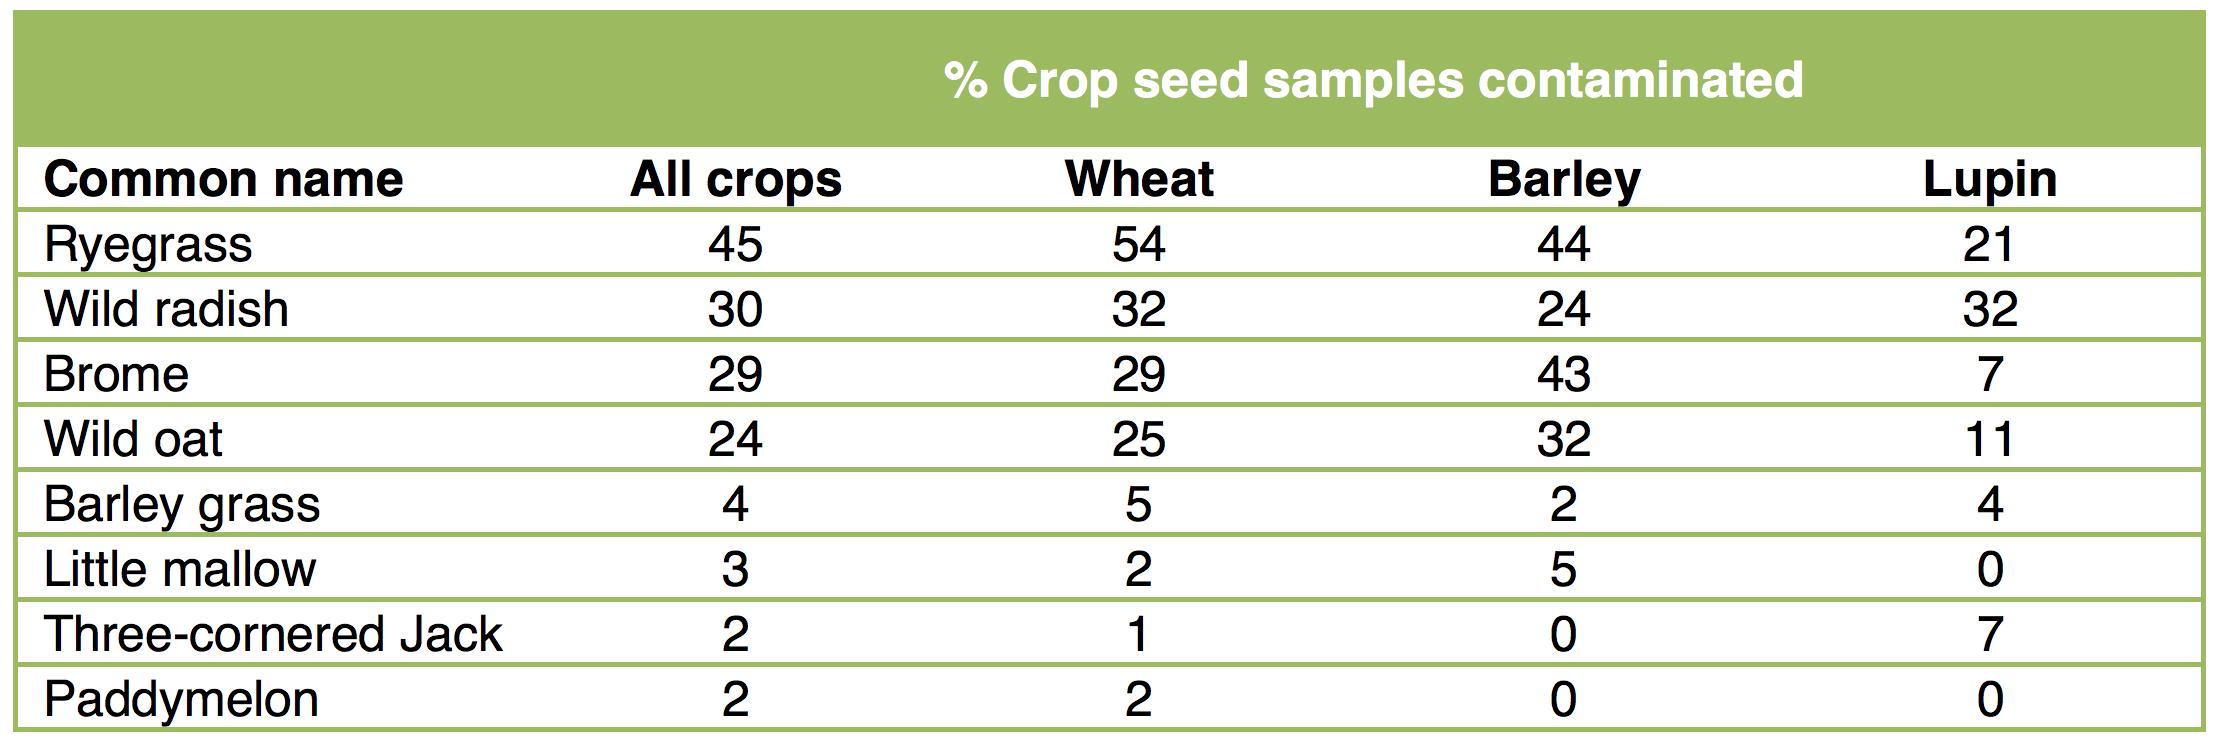 % crop seed samples contaminated